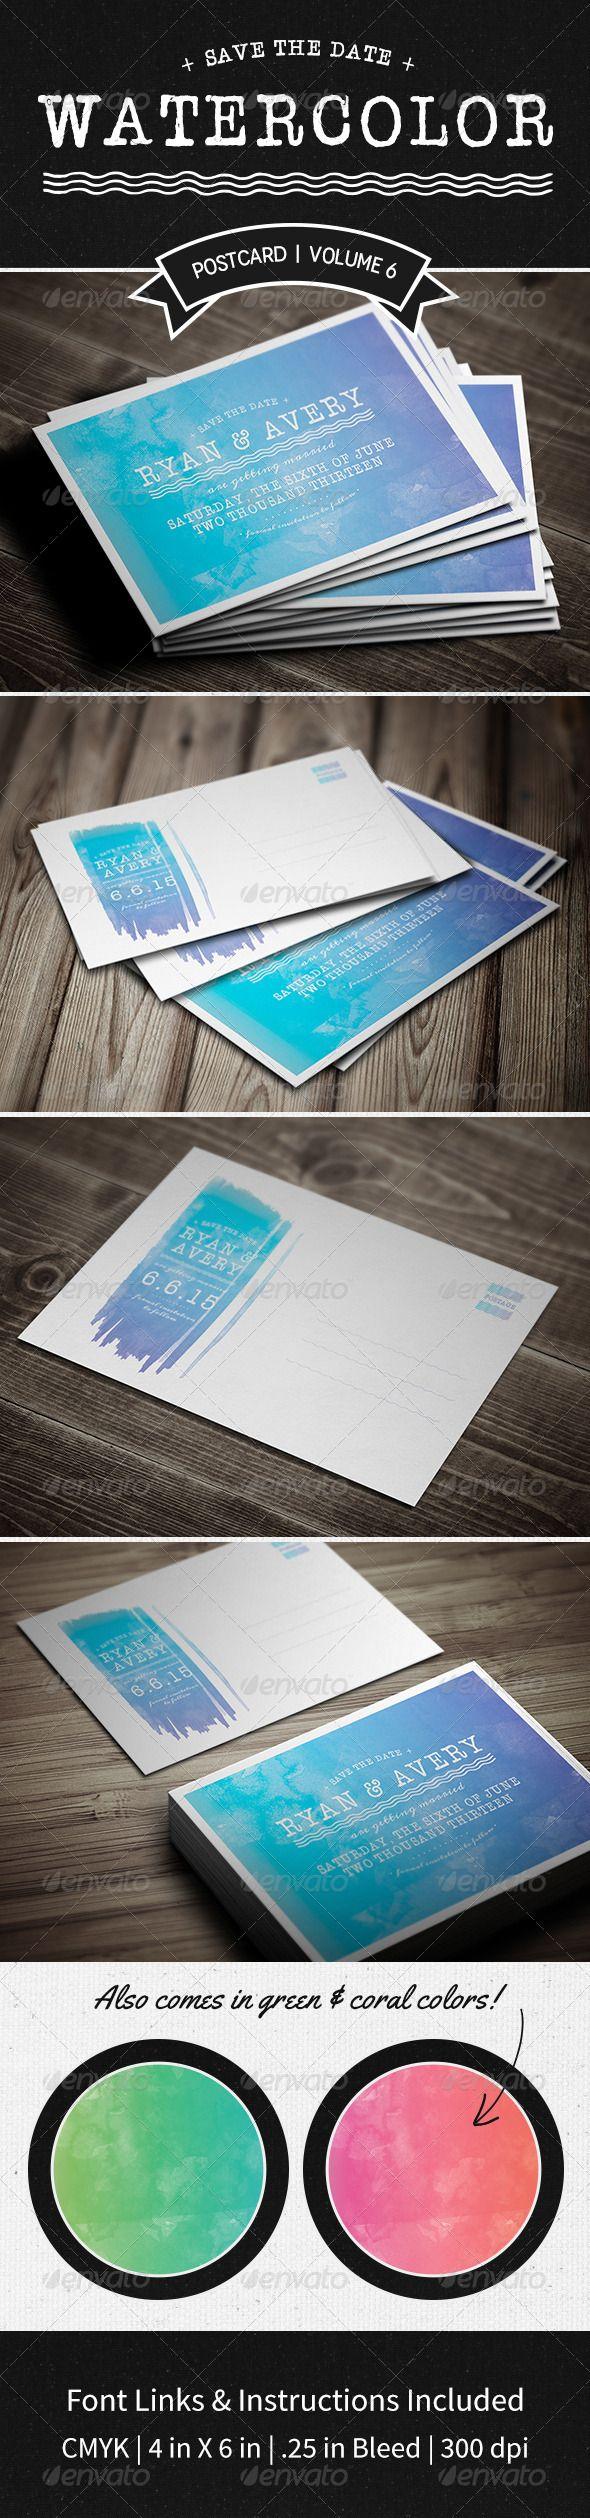 wedding invitation design psd%0A Save The Date Postcard   Volume     Watercolor  u     Photoshop PSD  card   typography